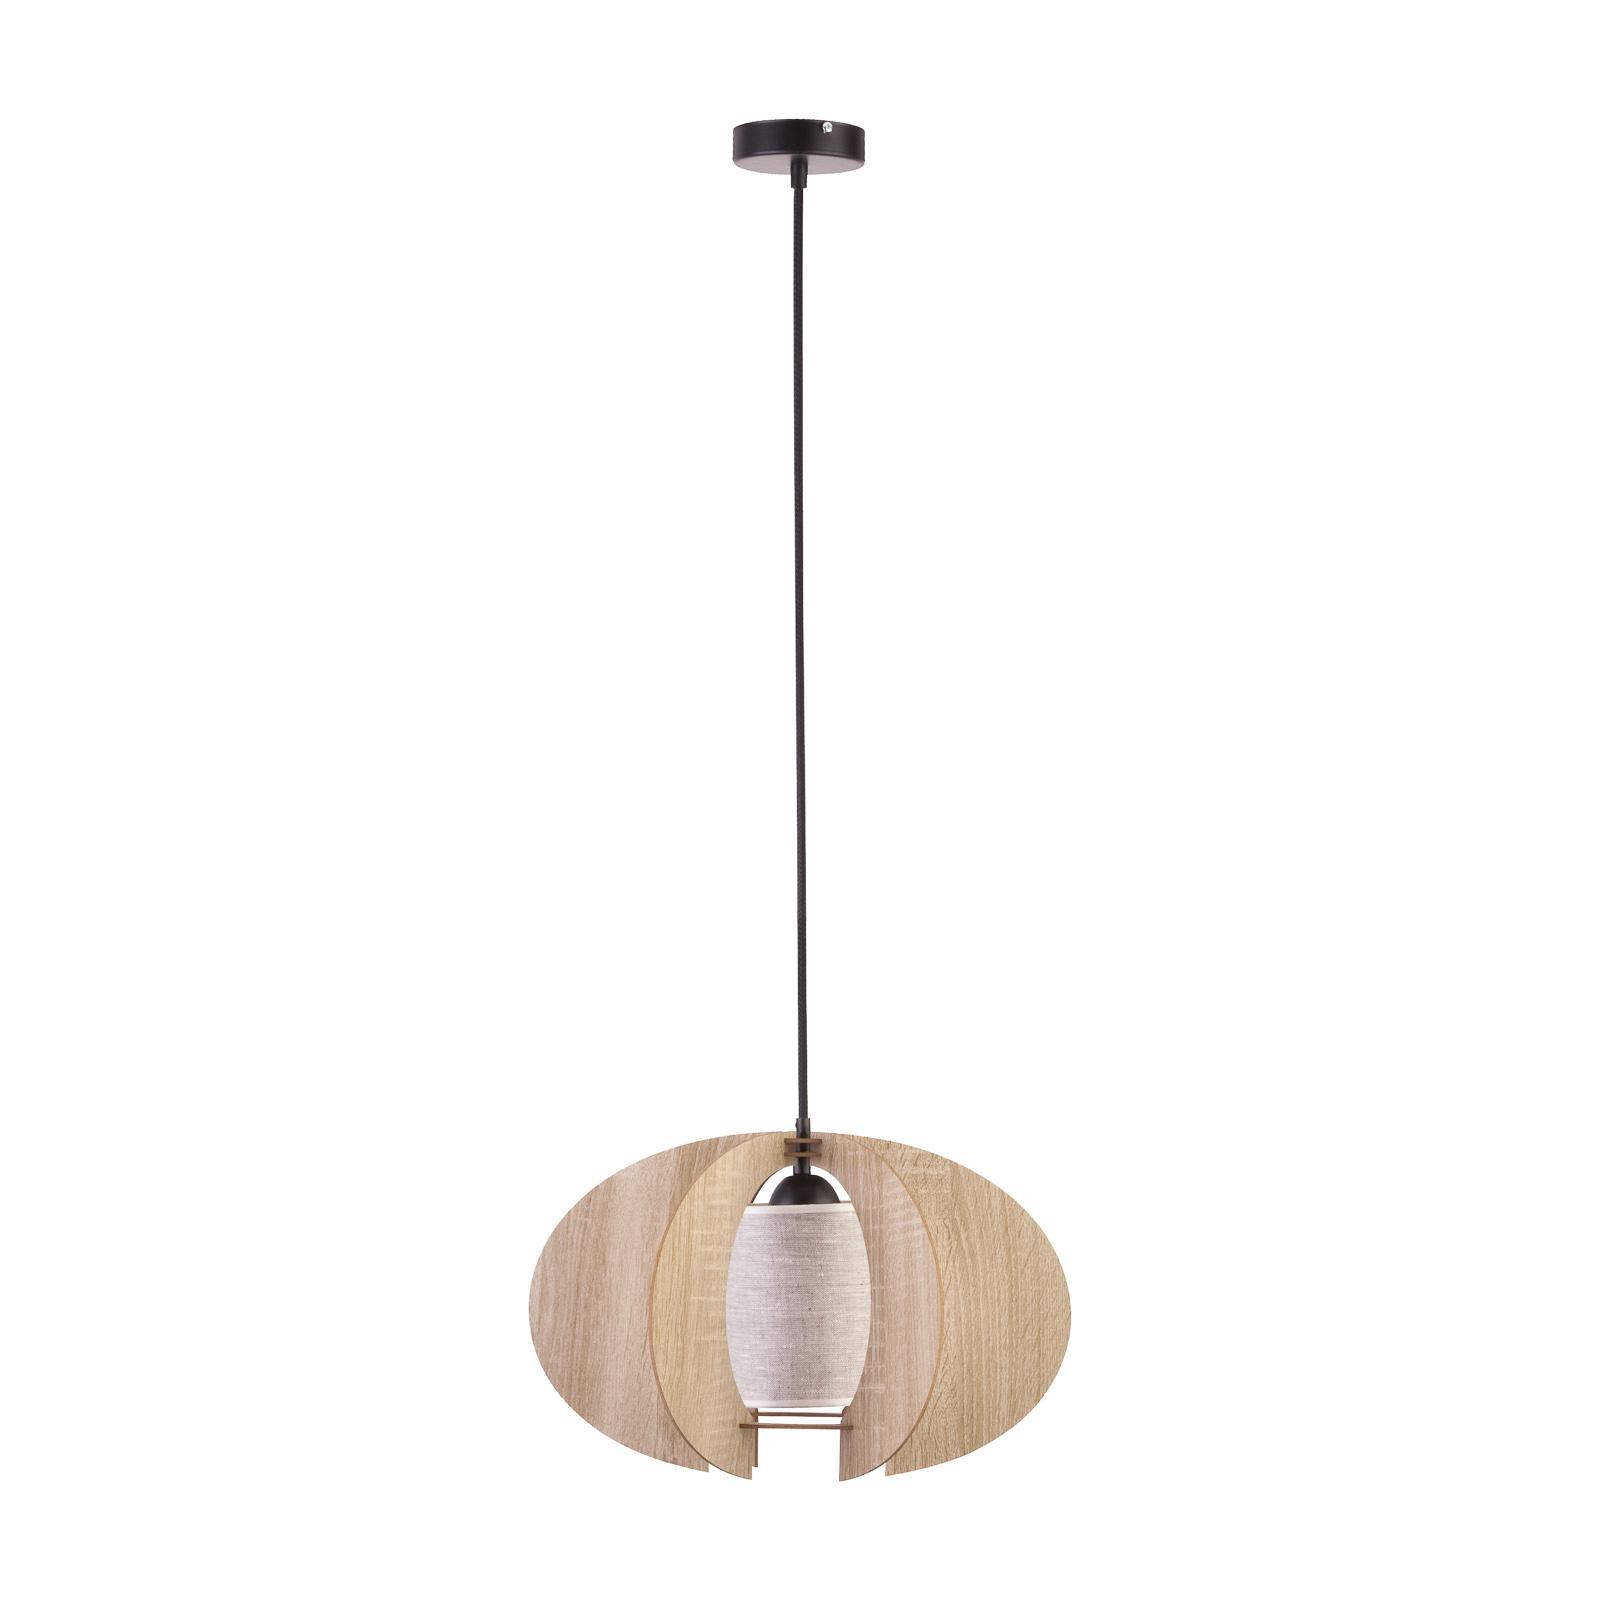 Hanglamp Modern C M met hout-lamellen Ø 50 cm